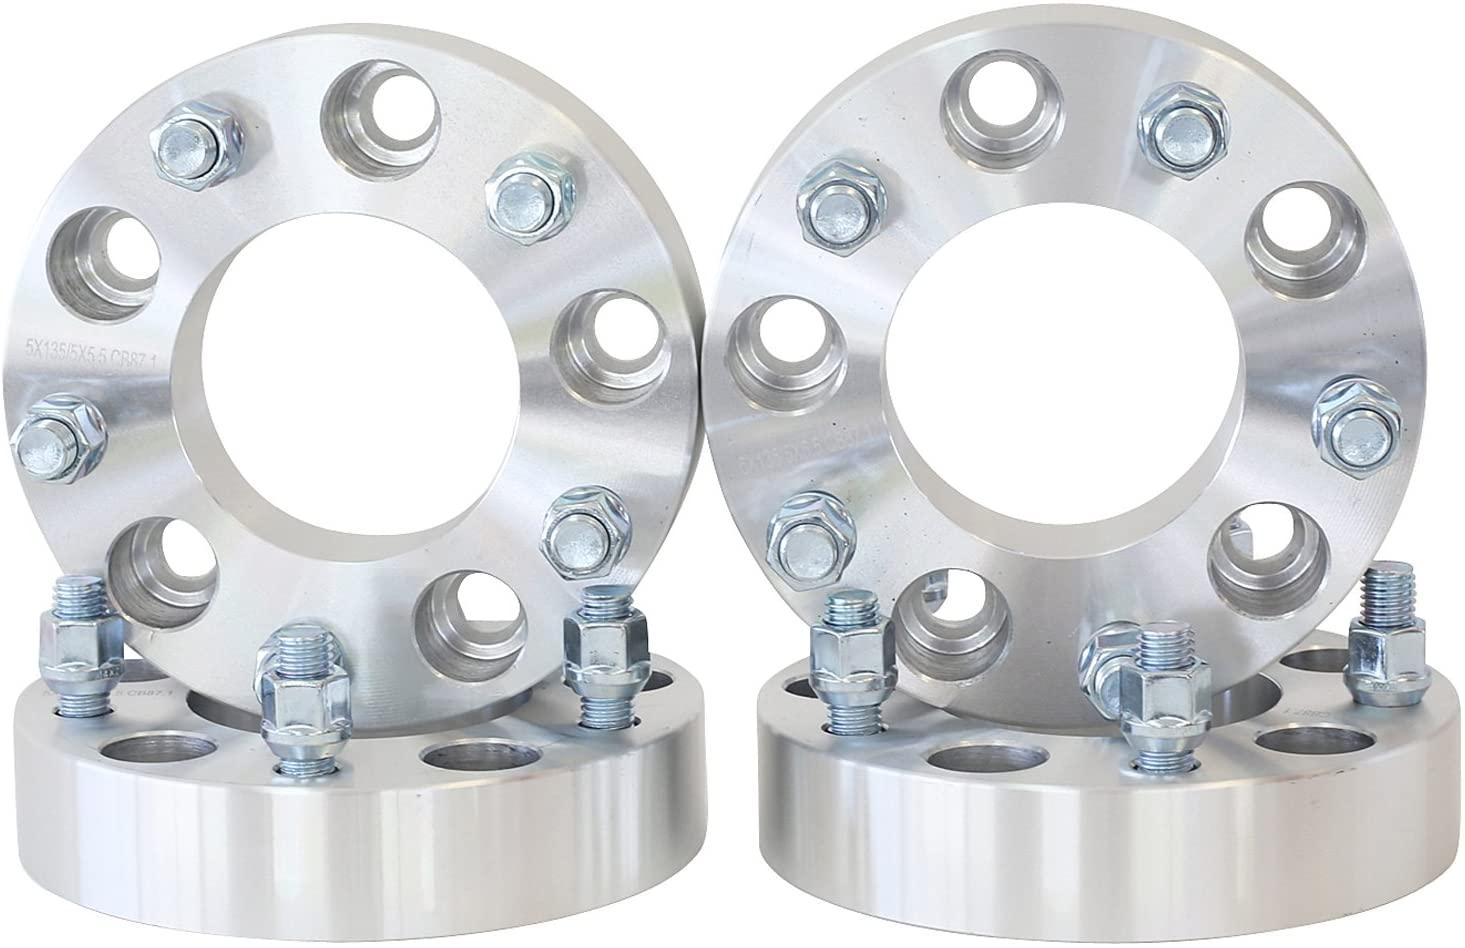 ATV Engineering 4 Qty Wheel Spacers Adapters 3